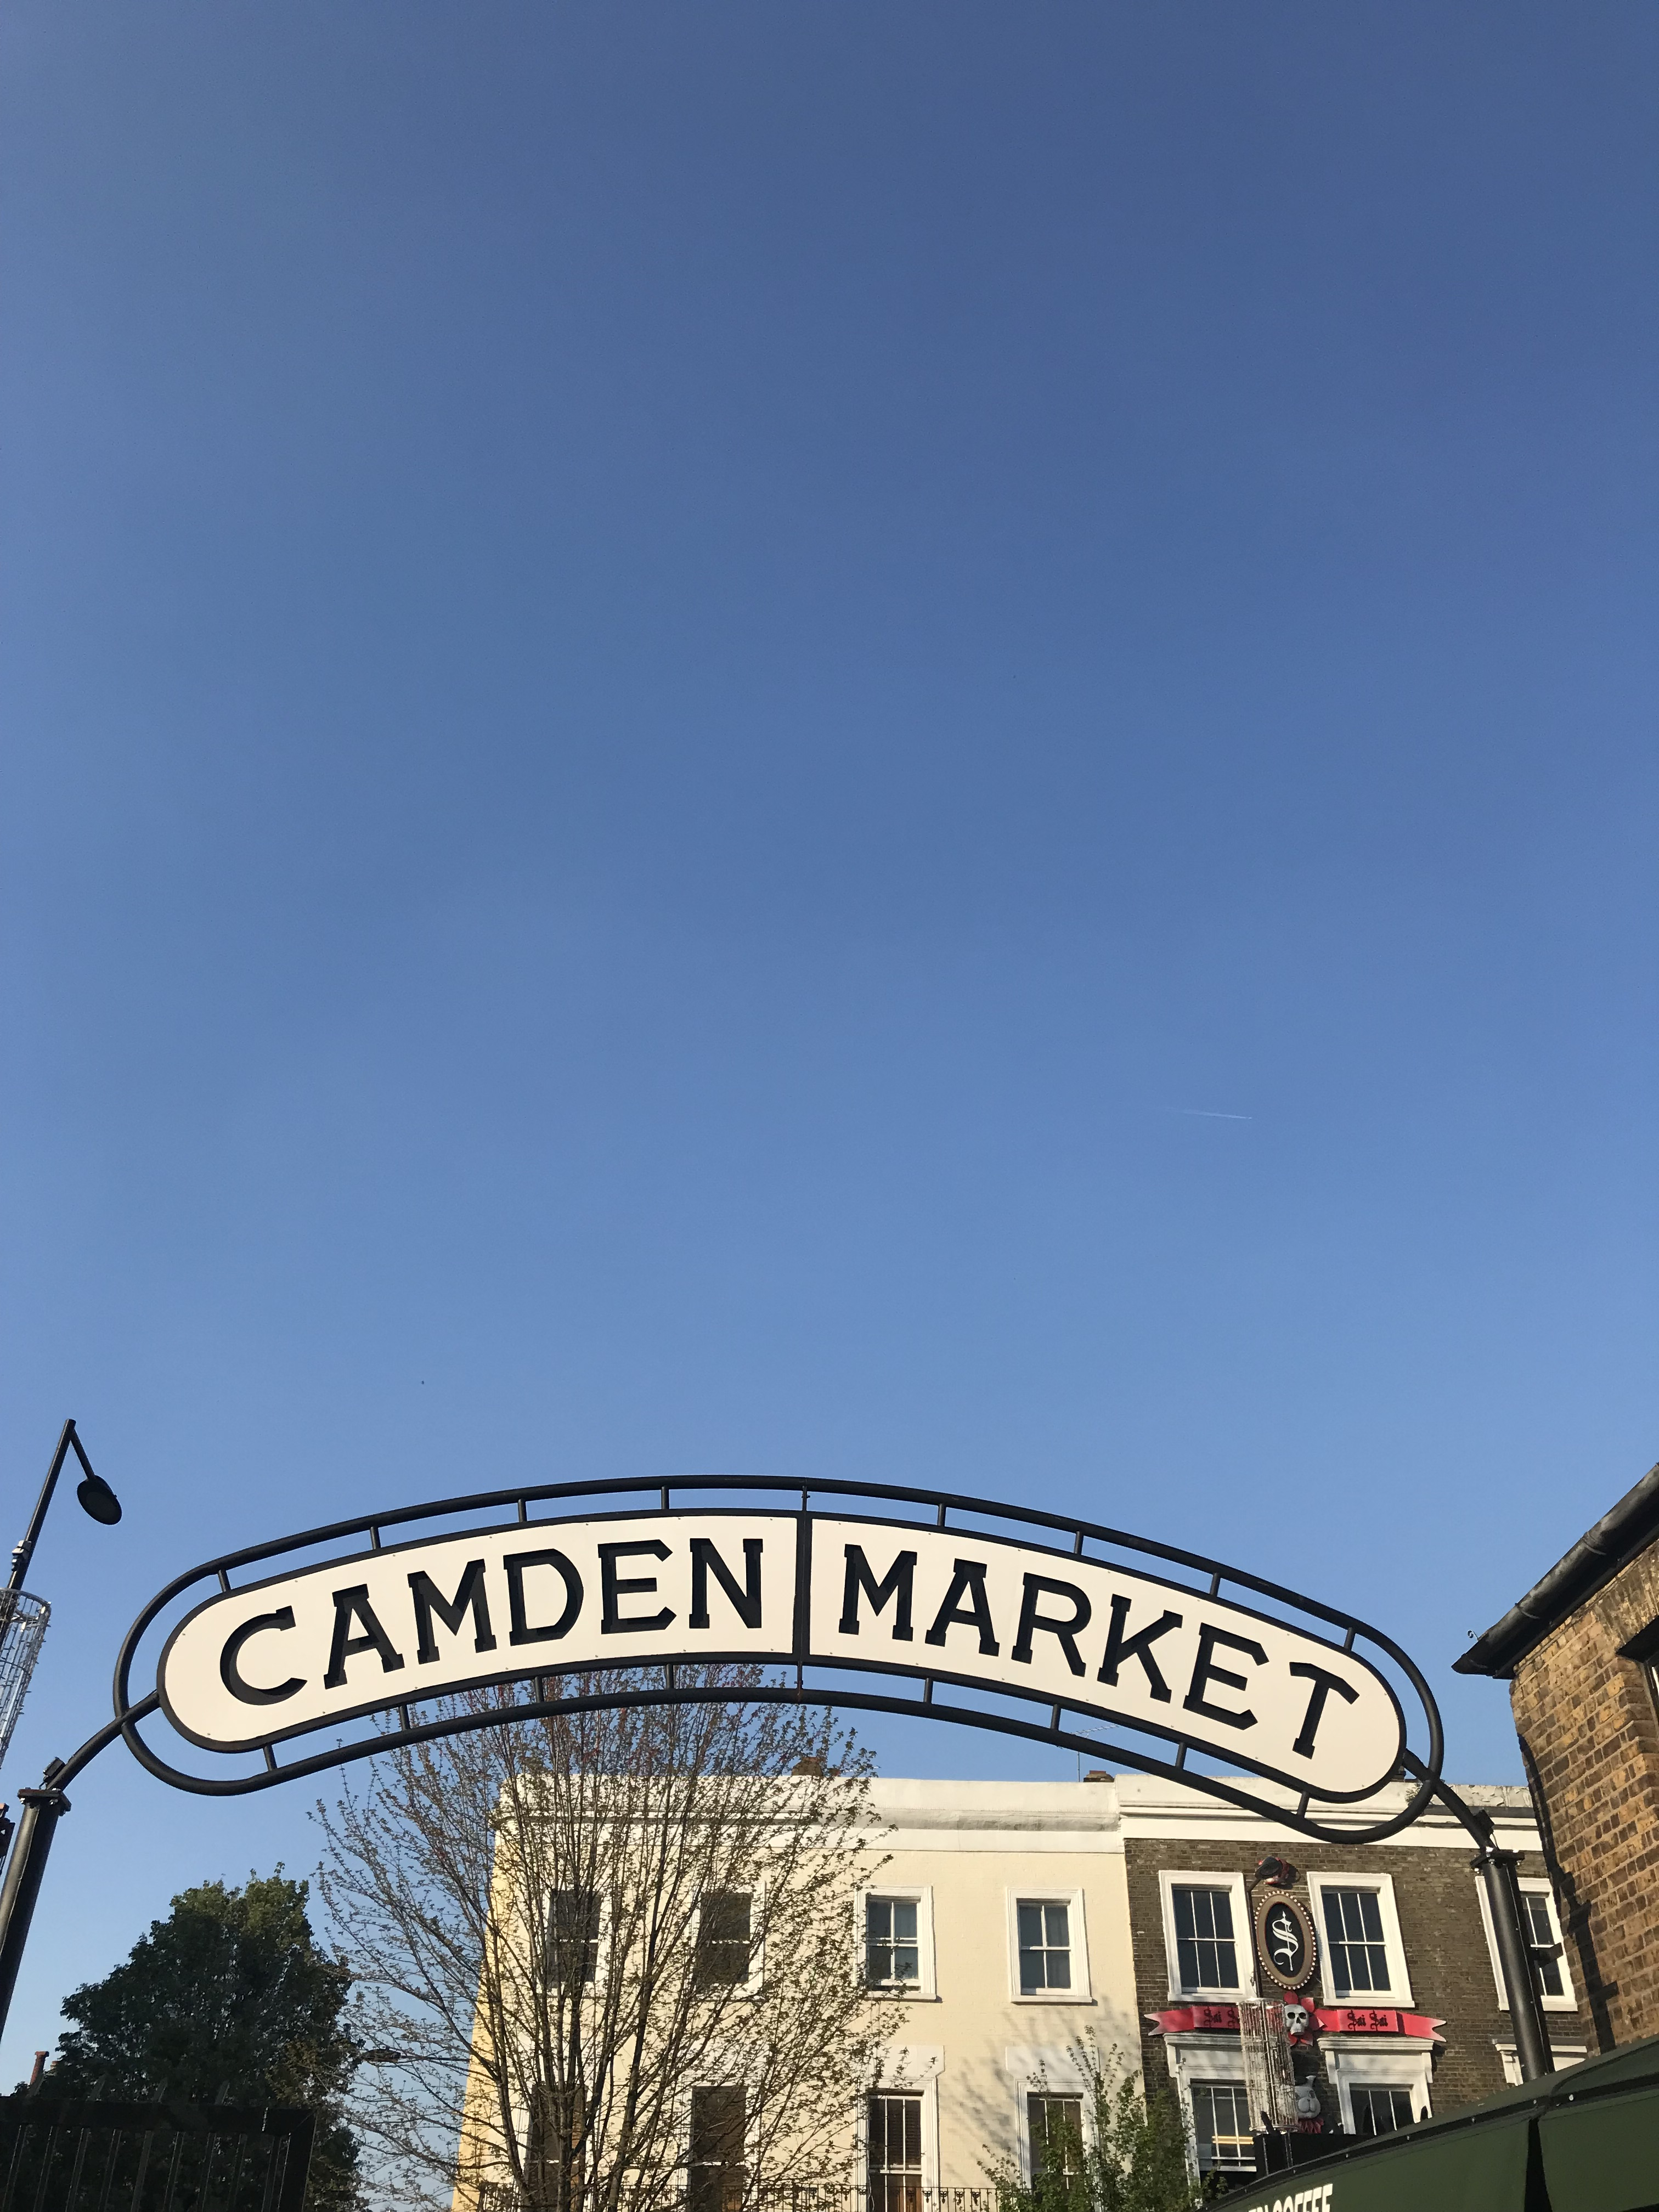 camden-market-camden-town-londra